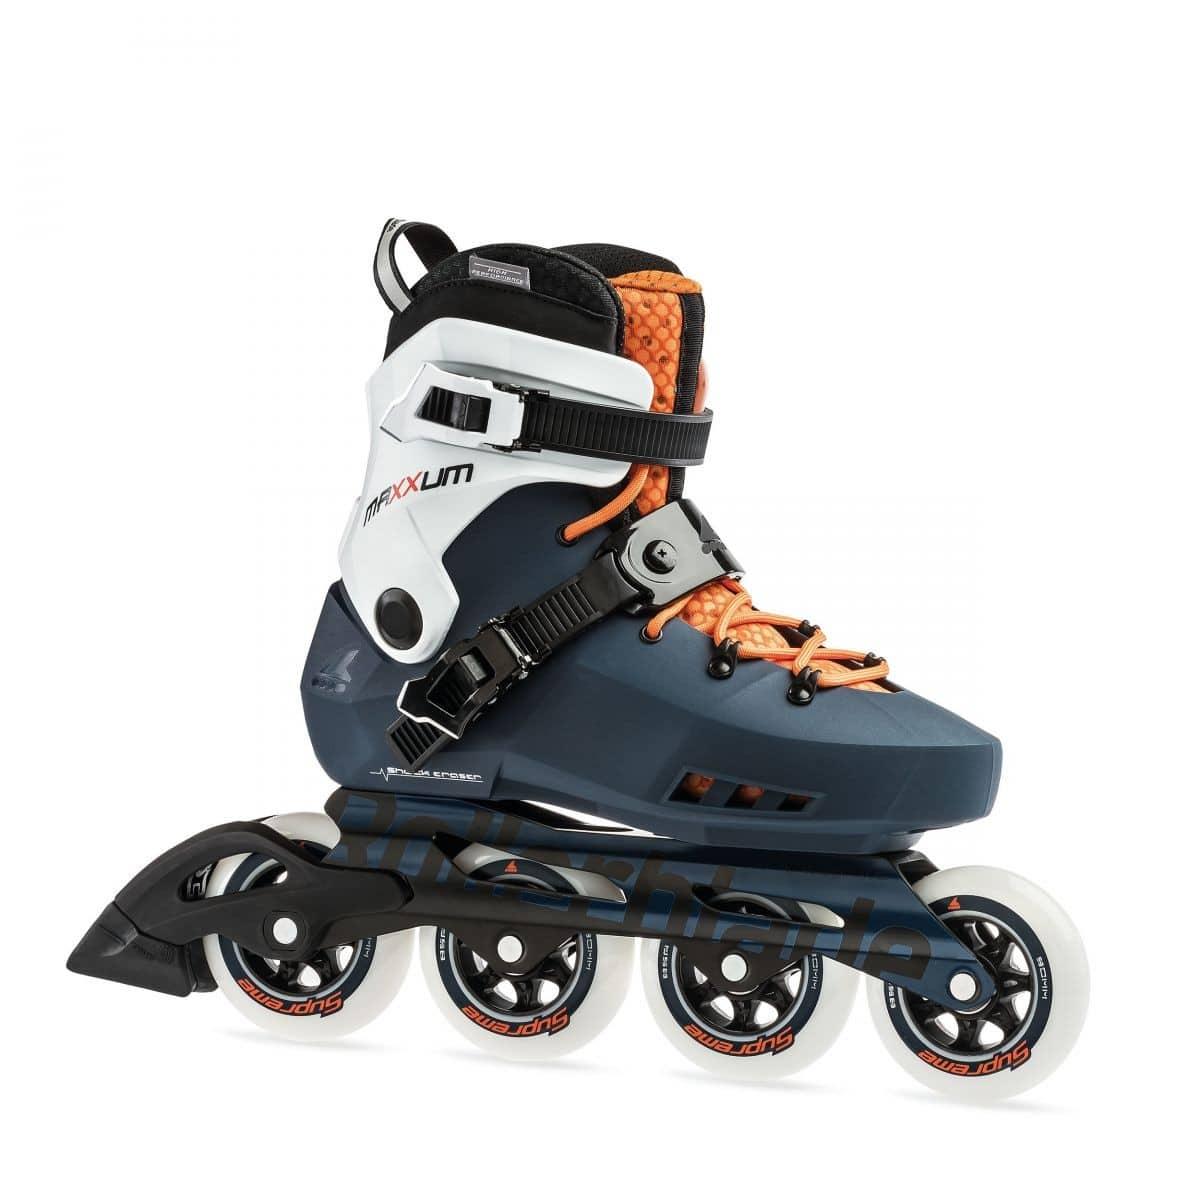 rollerblade maxxum edge 90 2020